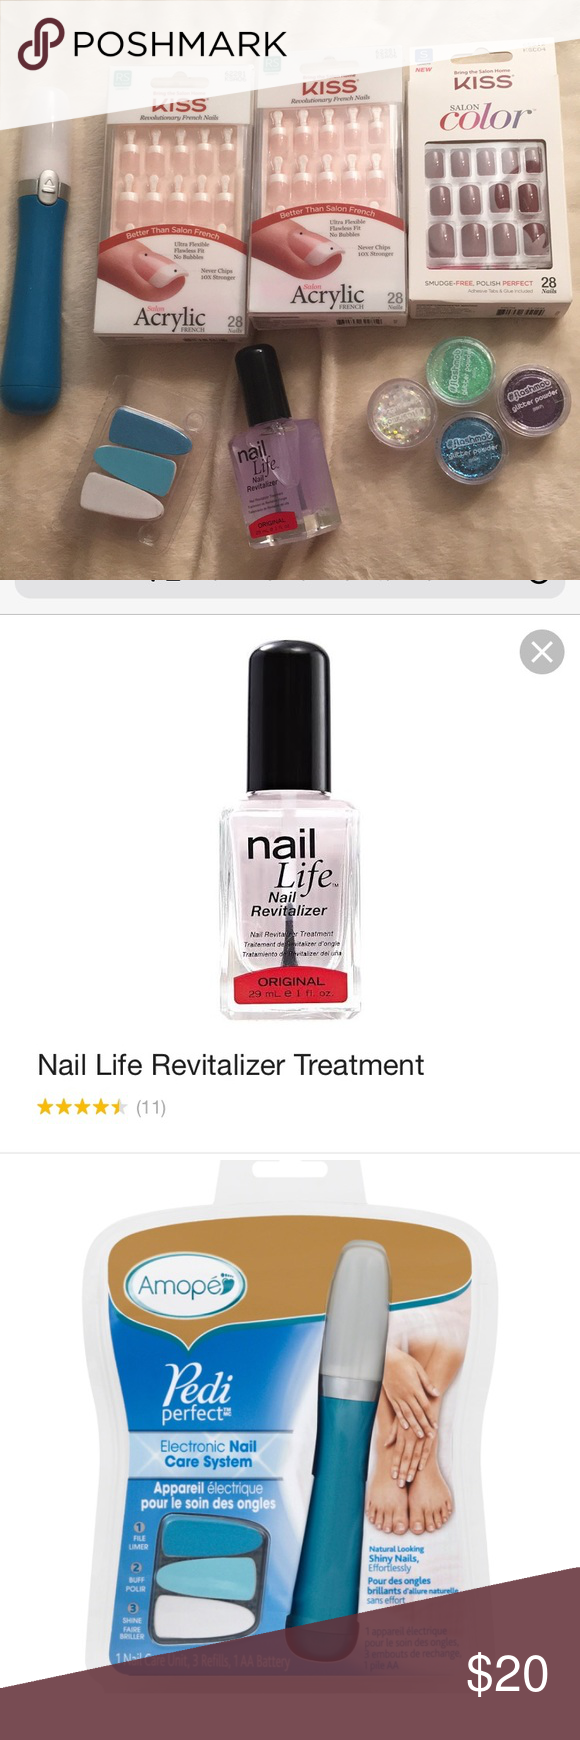 Miscellaneous nail care bundle | Short french nails, Short red nails ...